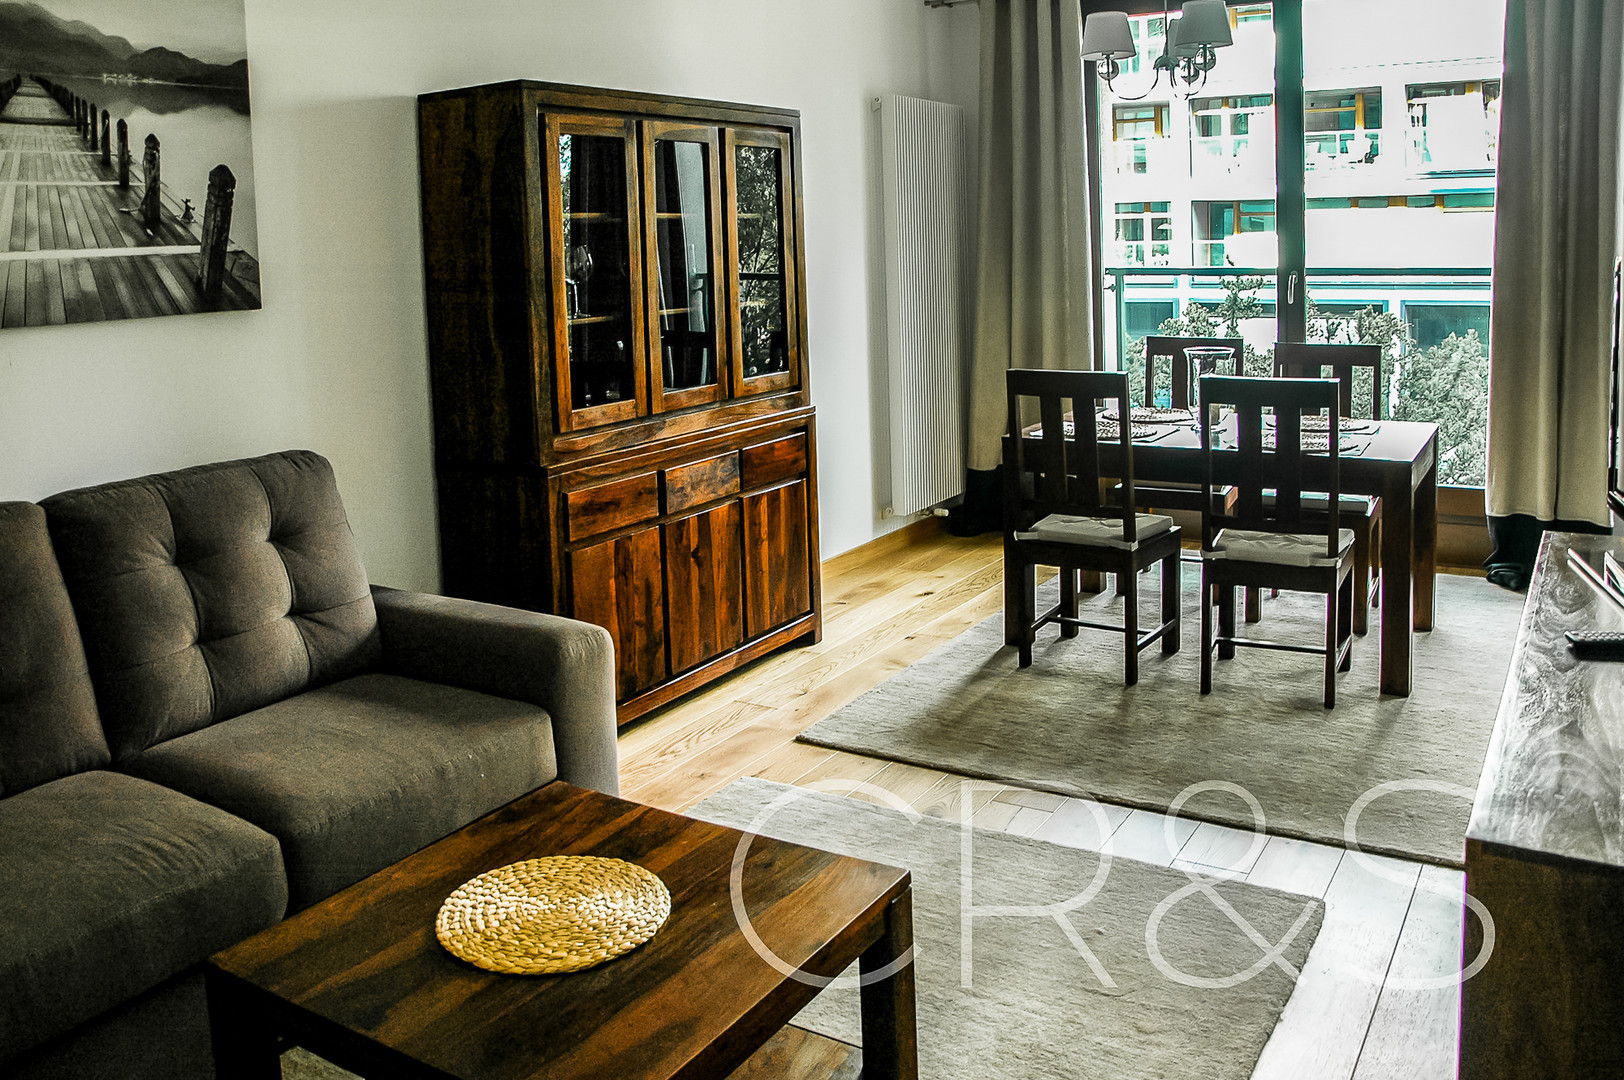 Apartments for rent Kolejowa Warsaw_0876